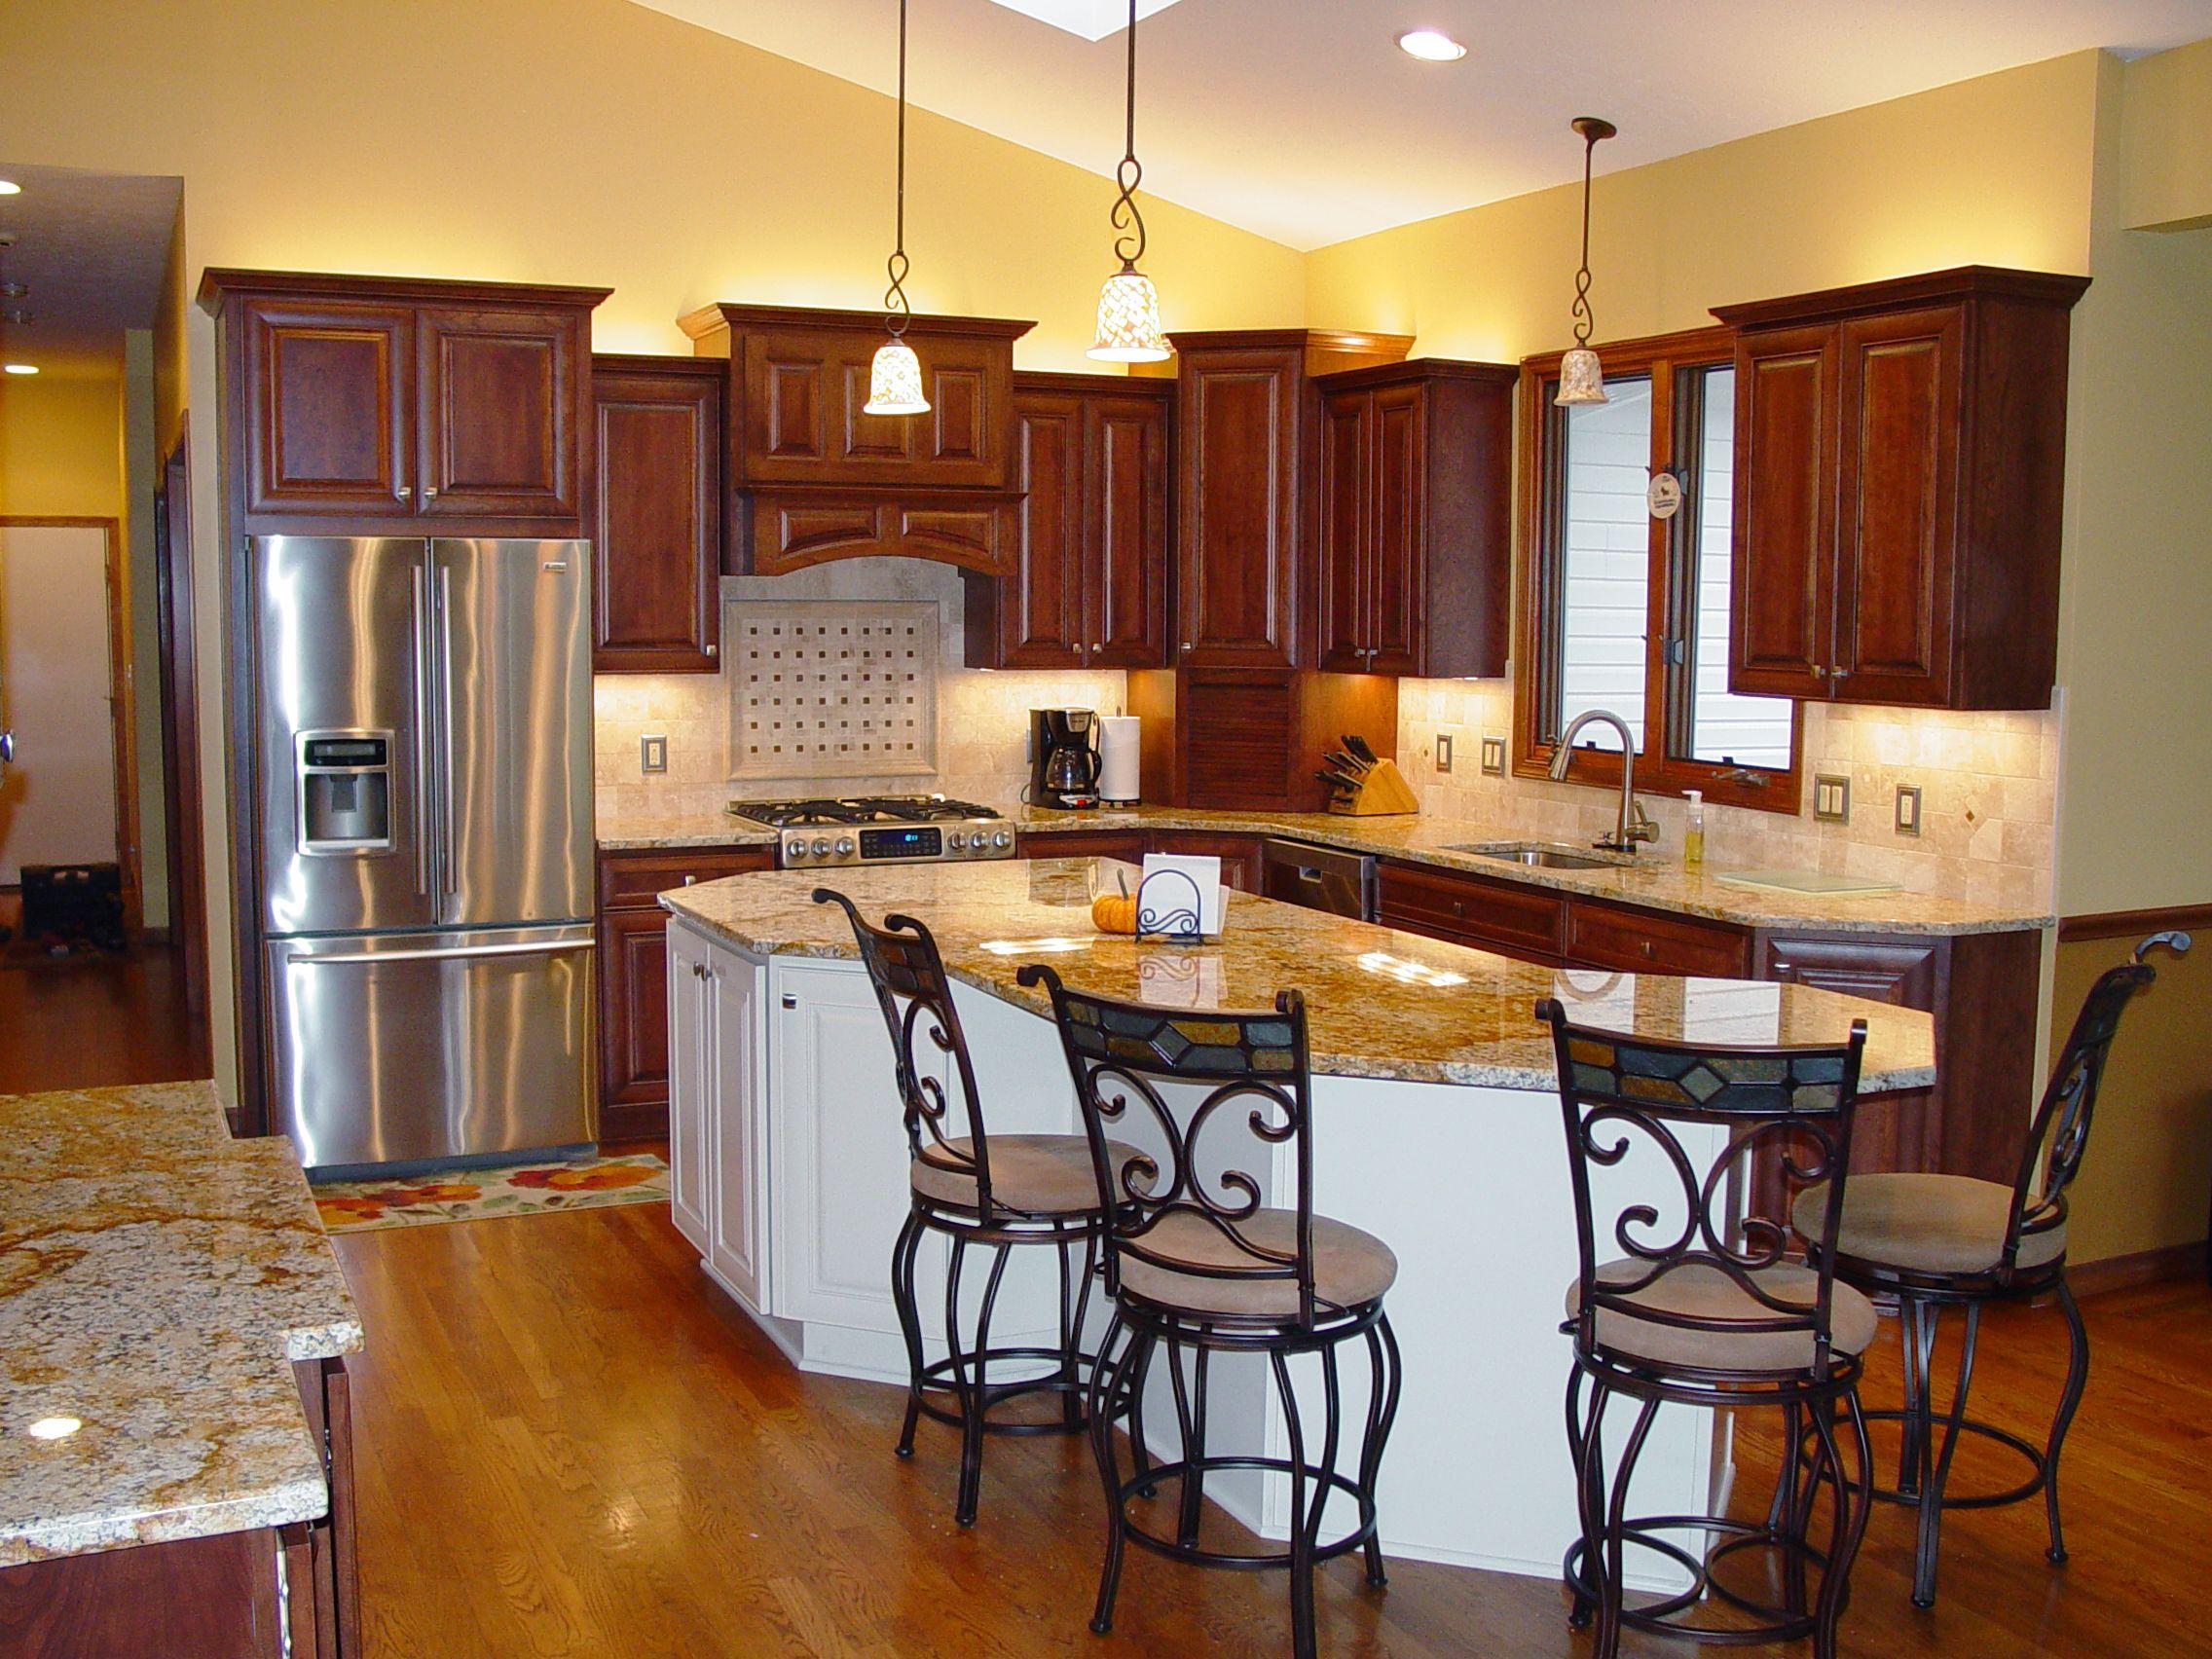 A Kitchen In Moreland Hills Ohio Has A Warm Rich Look Designer Emeil Soryal Used Starm Kitchen Cabinet Design Brown Kitchen Cabinets Cherry Cabinets Kitchen